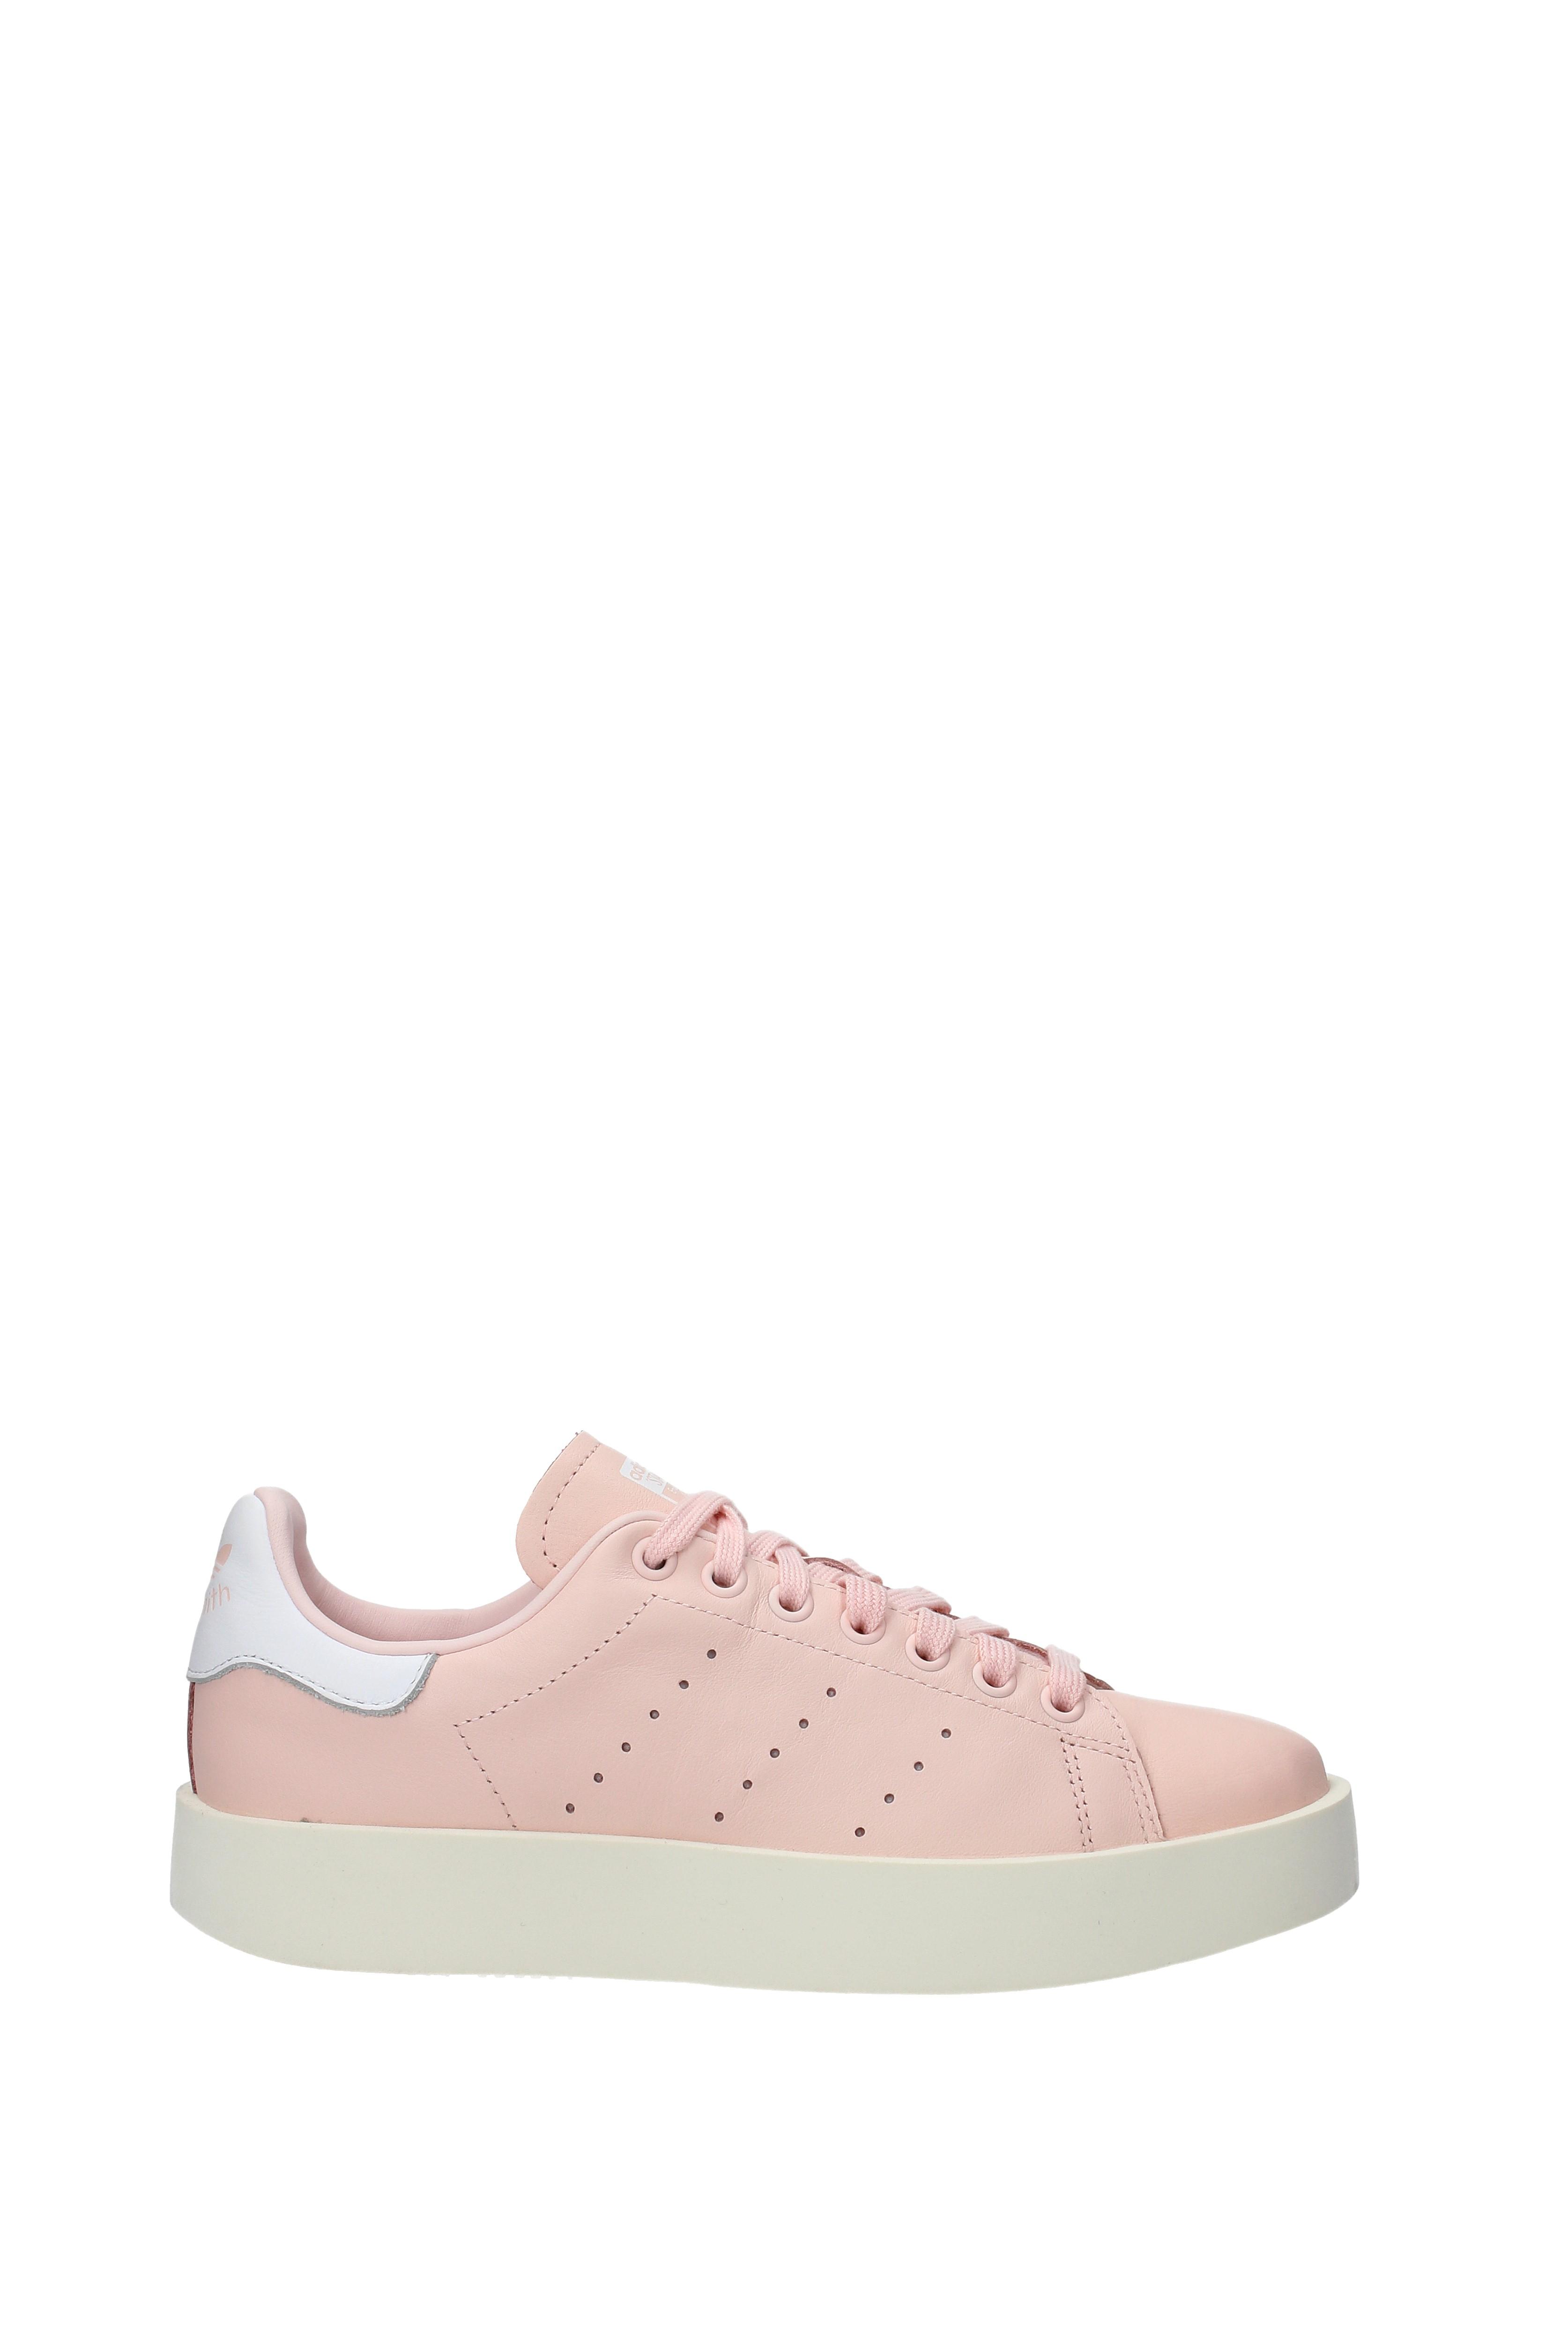 Sneakers Adidas Damens - Leder (BY297) (BY297) Leder d4f457